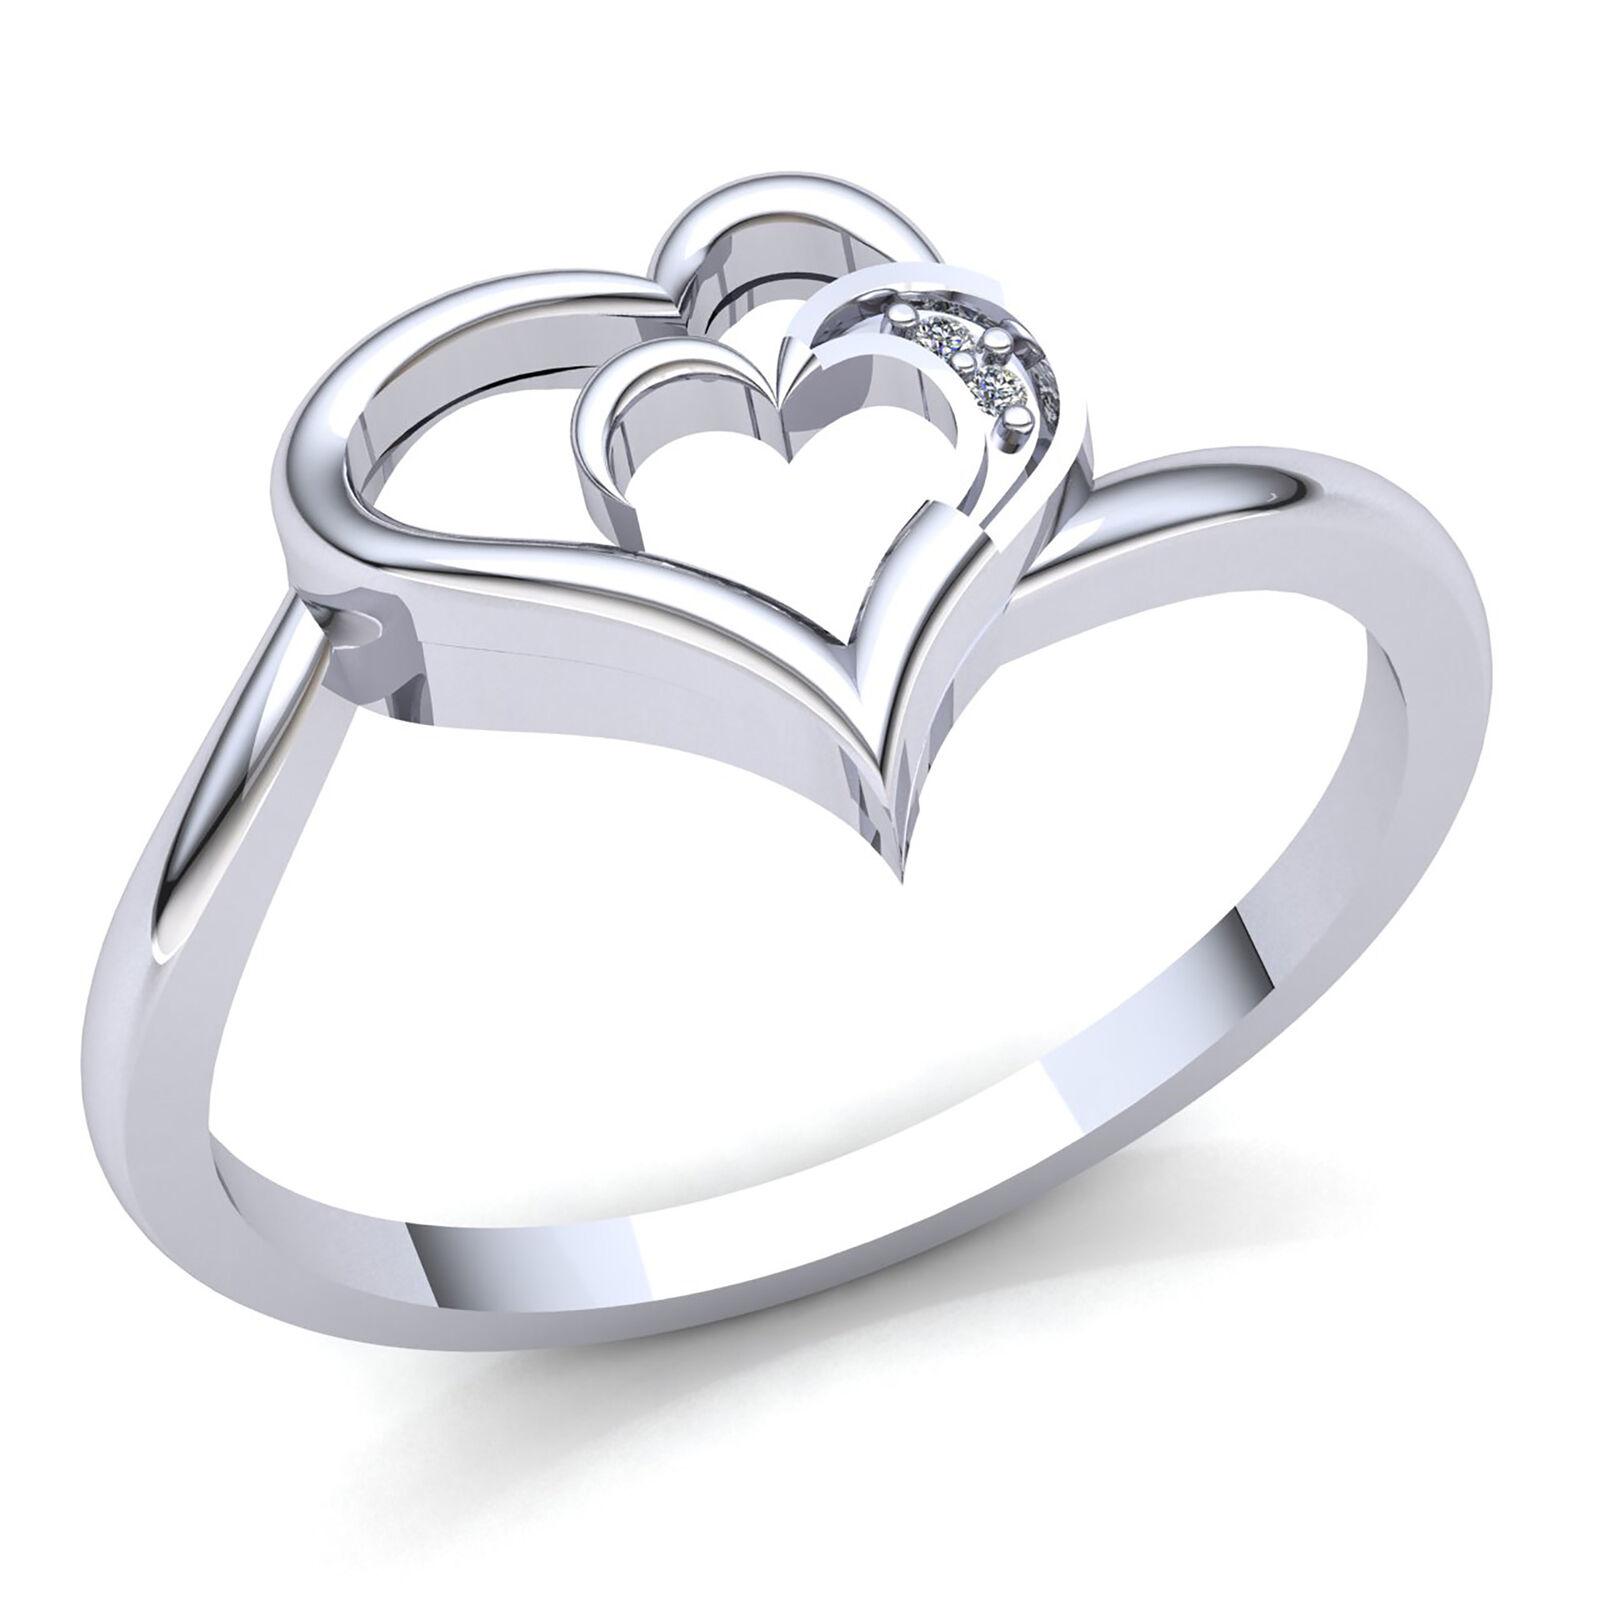 f46c5ca2a61 Genuine 0.01ct Round Cut Diamond Ladies Double Heart Anniversary Ring 18K  gold nwcktj5978-Diamond